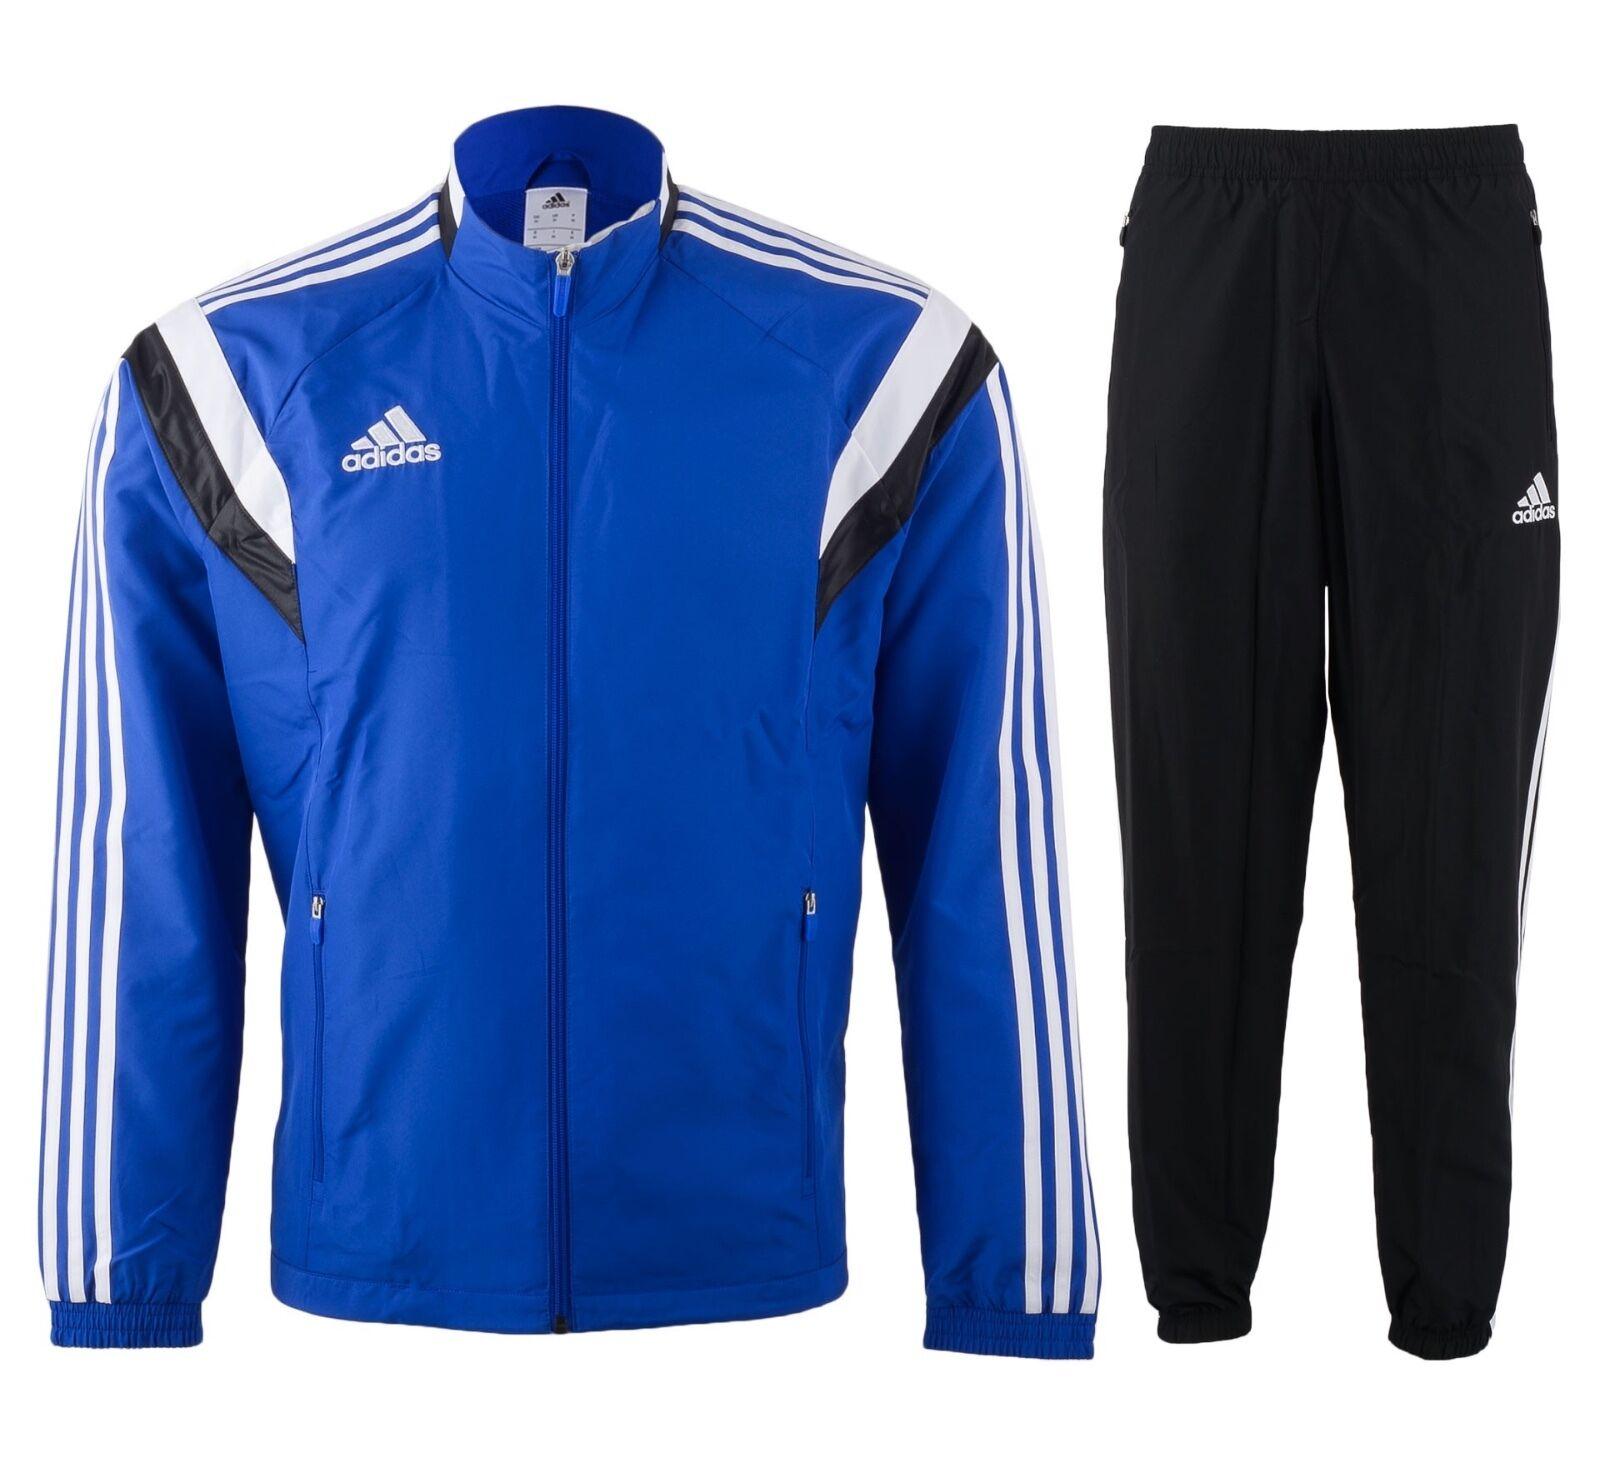 Adidas Performance Condivo 14 Polyesteranzug Herren blau     schwarz NEU 2e6533